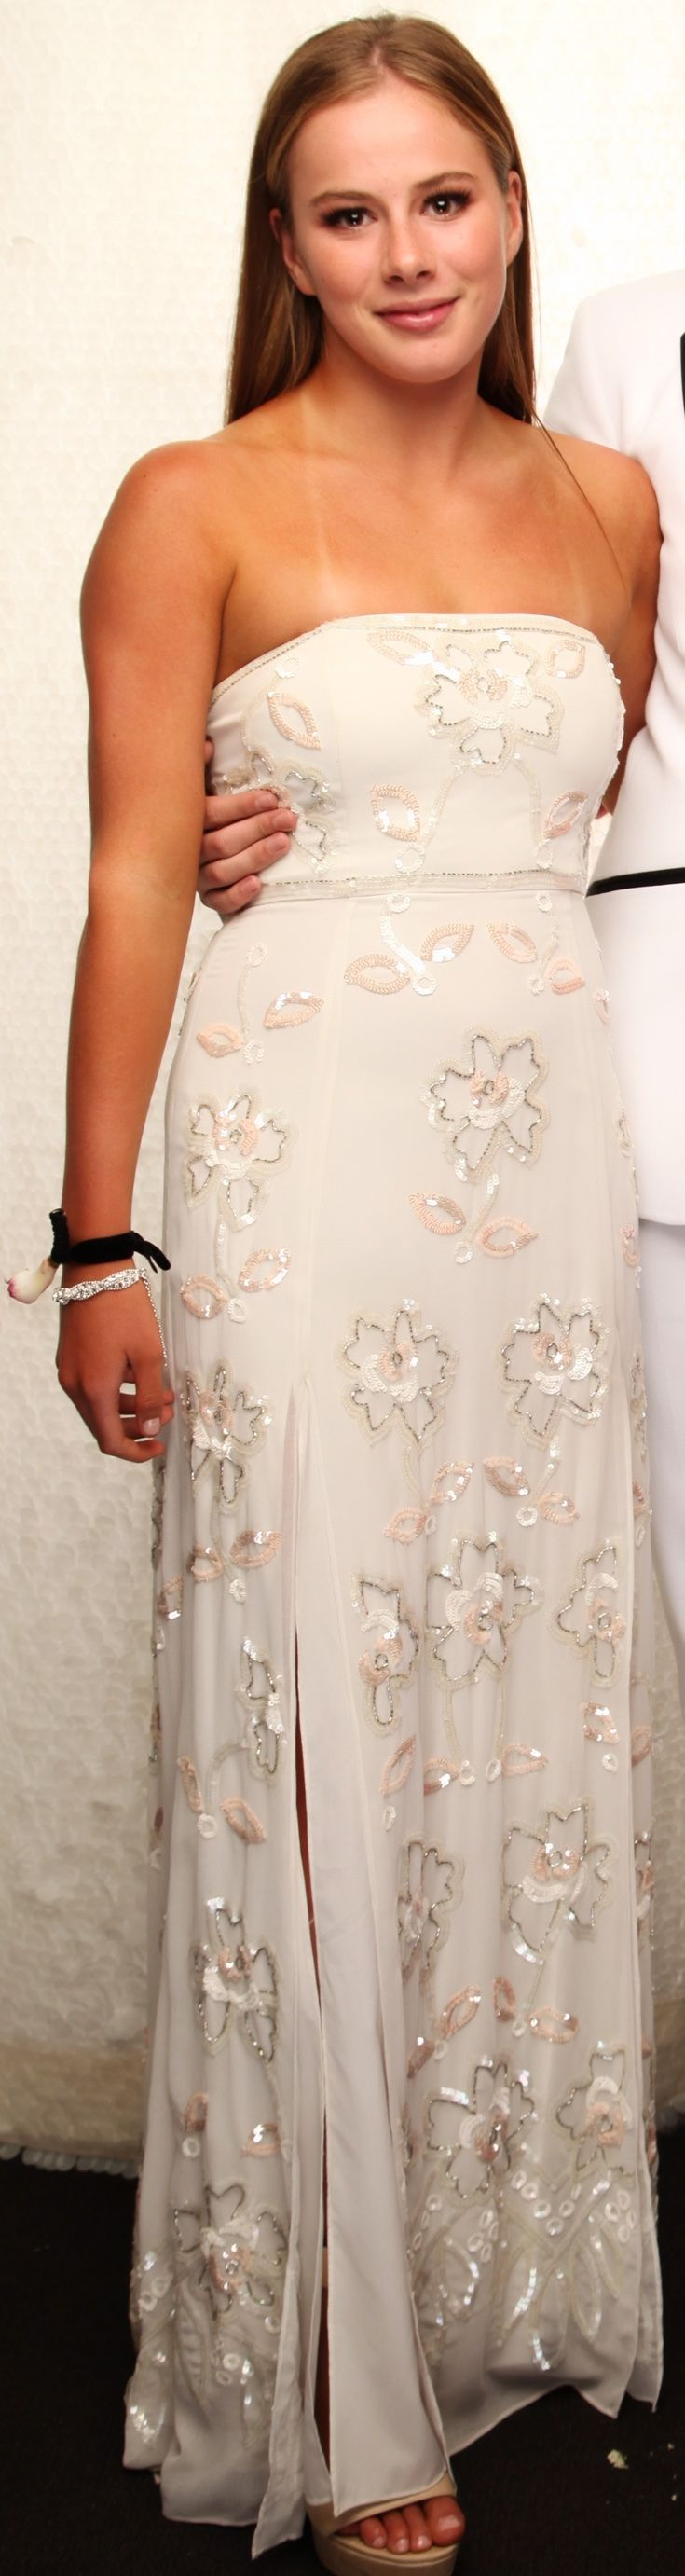 Glendowie Ball 2016. How beautiful is this beaded gown?! www.whitedoor.co.nz